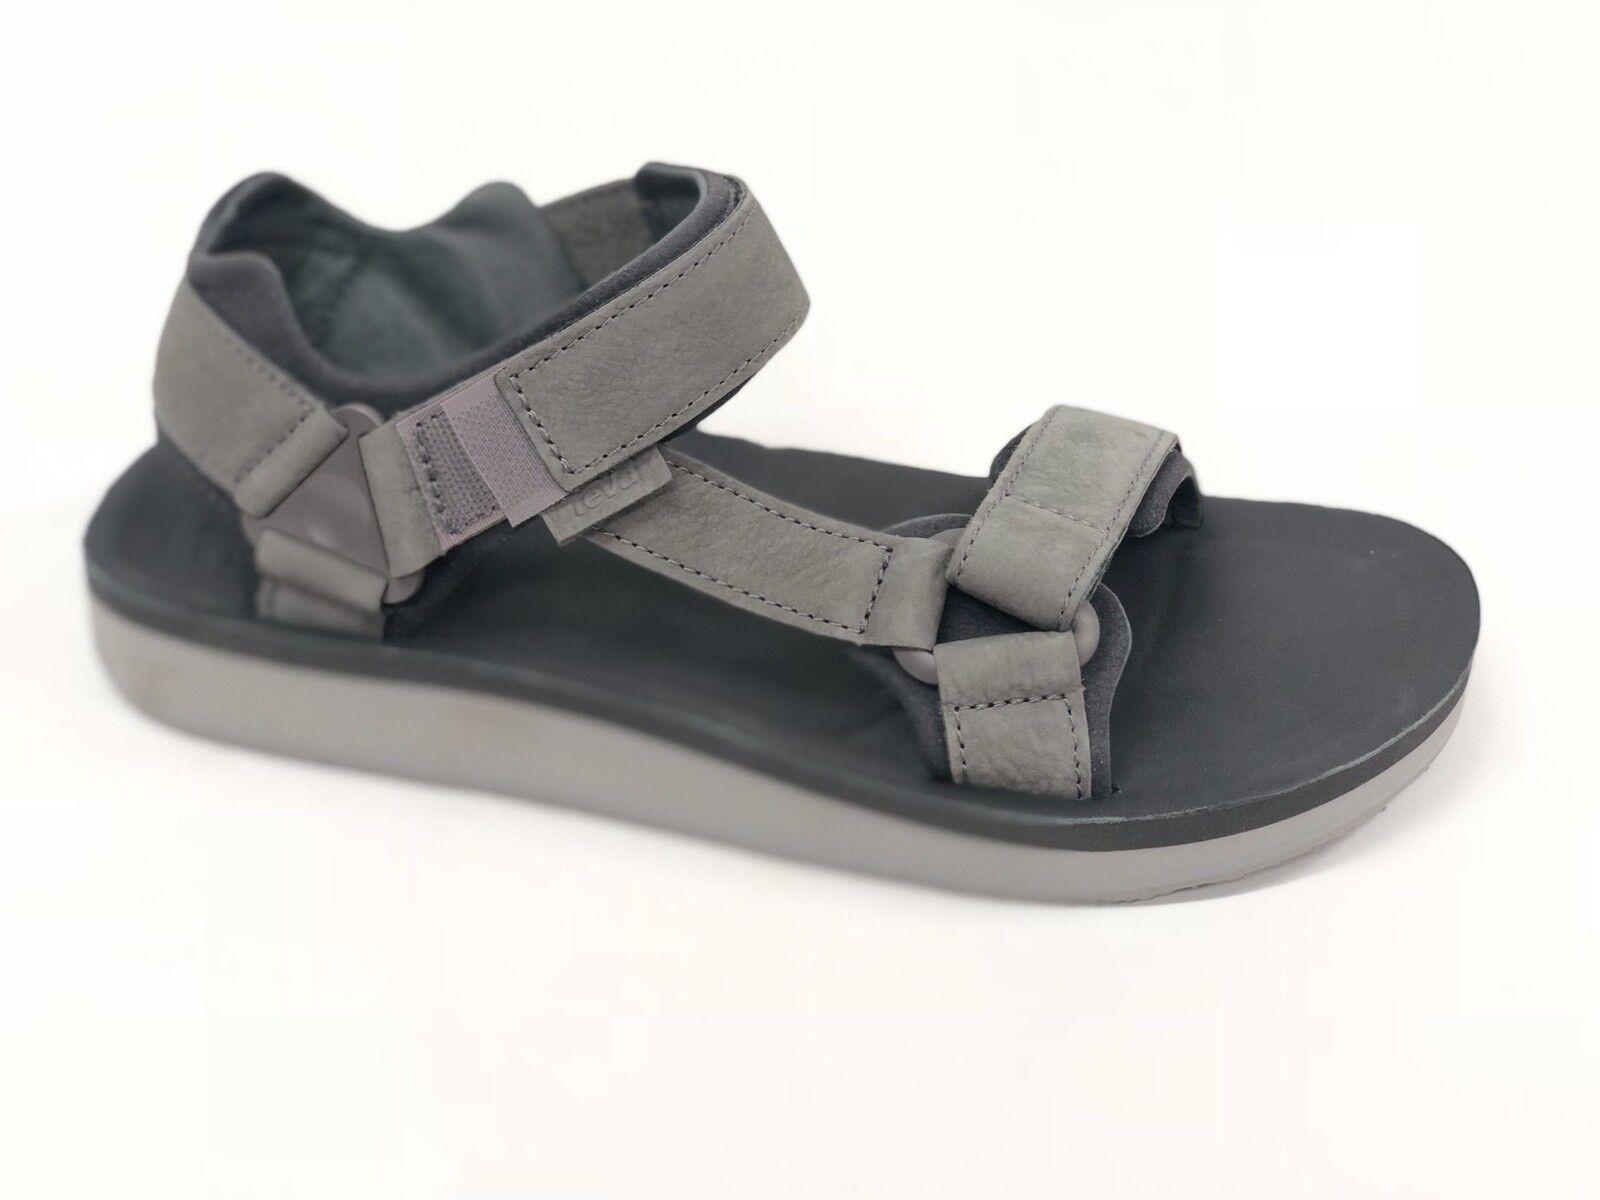 Teva Uomo Original Universal Premier Pelle Casual Sandals Charcoal Grey 1015928